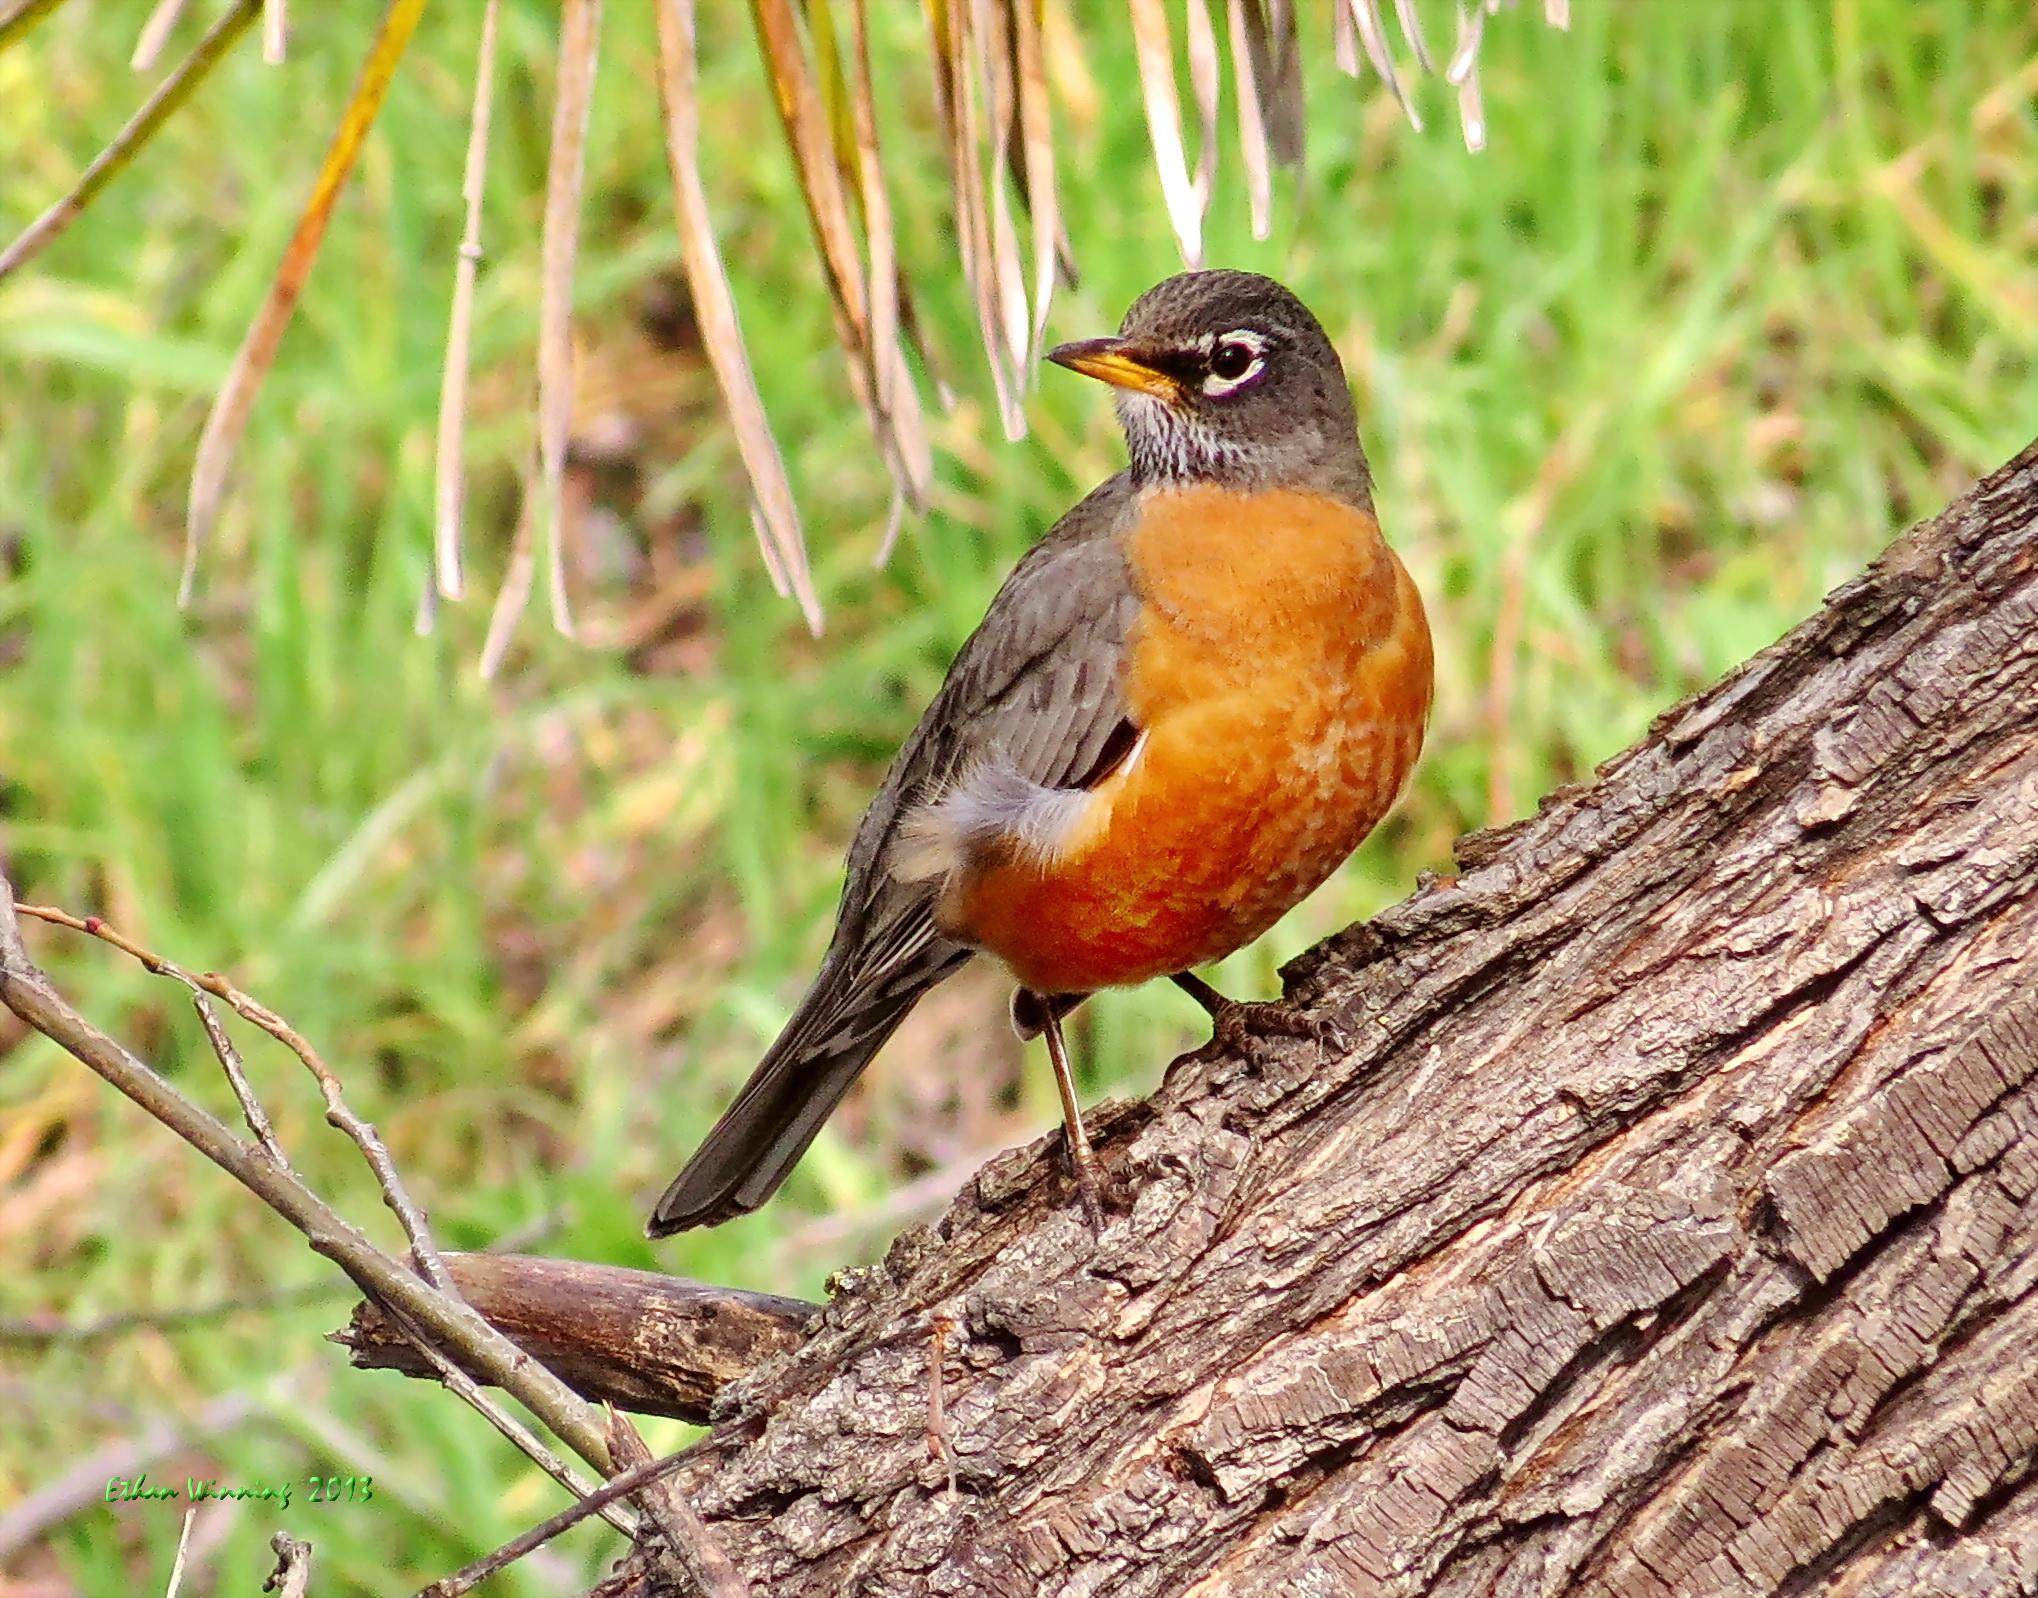 American Robin on the log